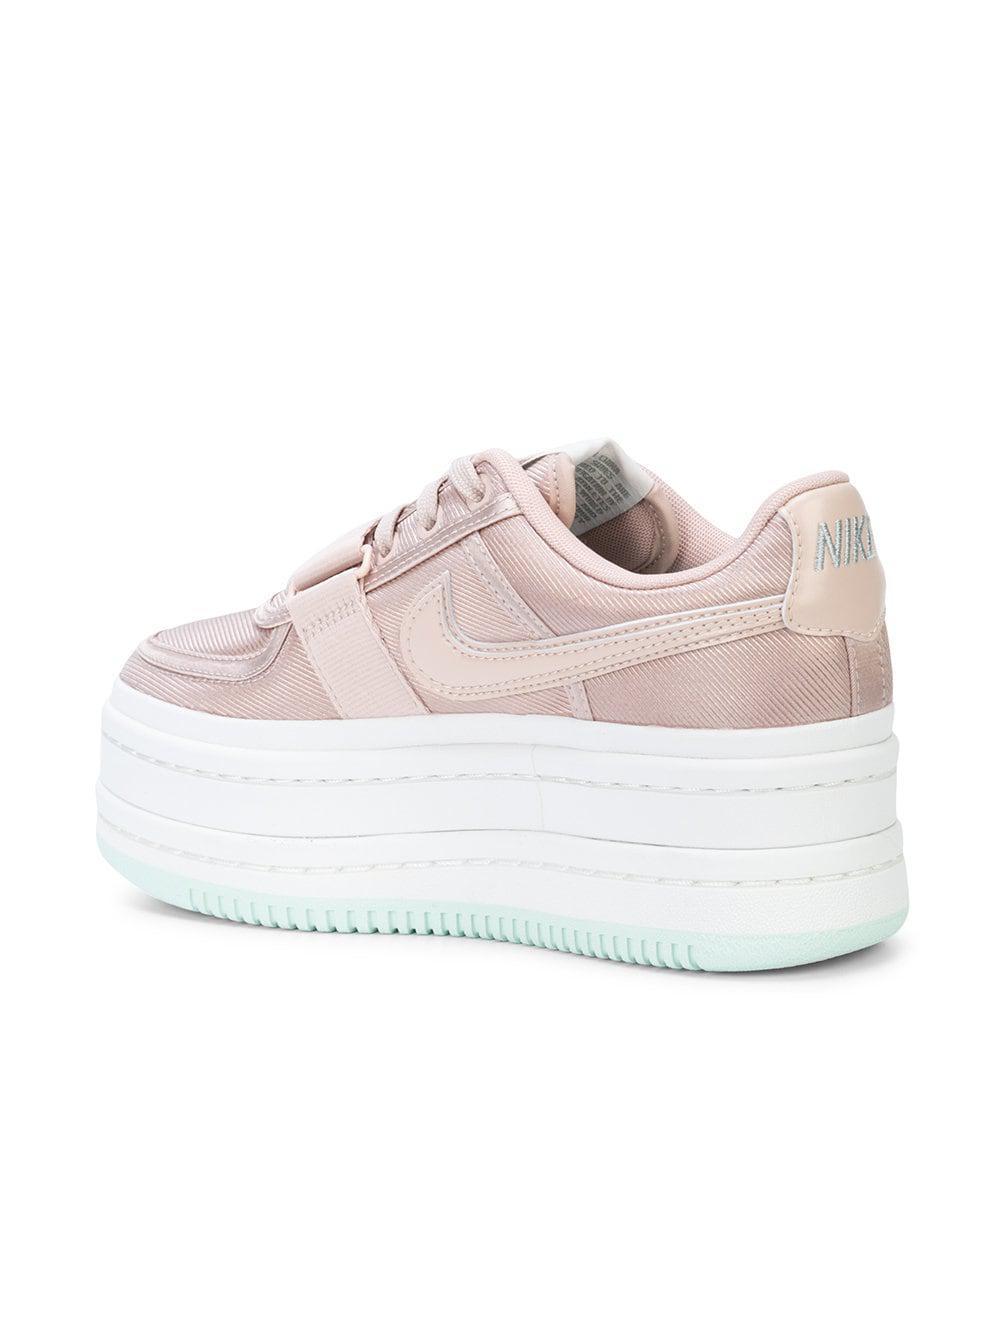 Nike - Pink Vandal 2k Sneakers - Lyst. View fullscreen